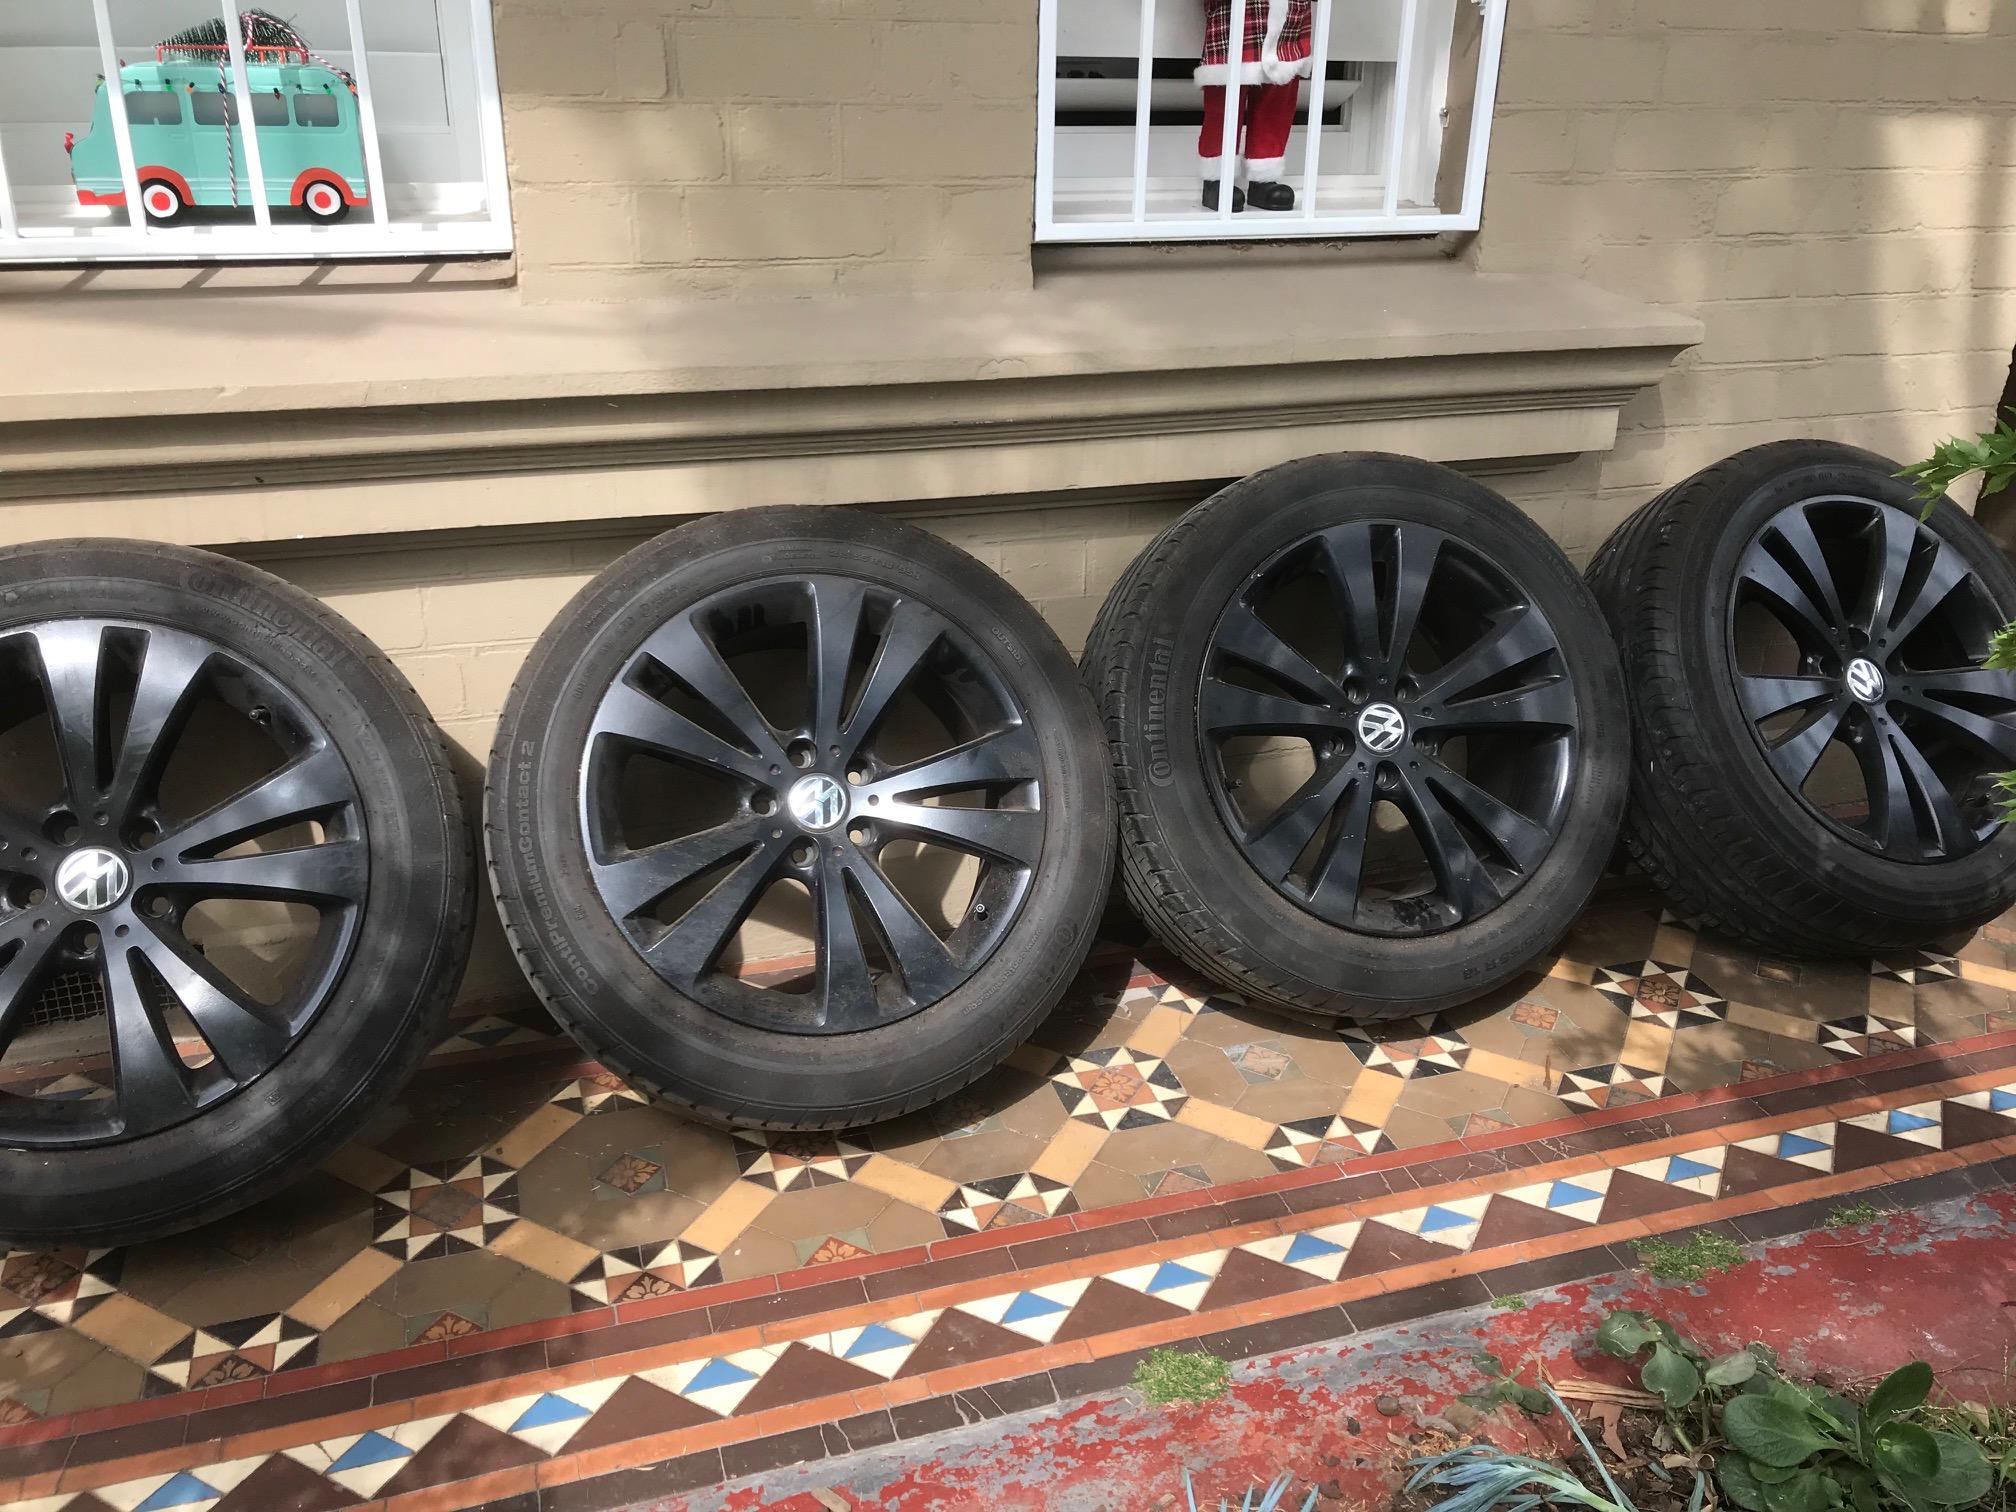 4 x Conti Premium Contact 2 Volkswagon Tyres – As New